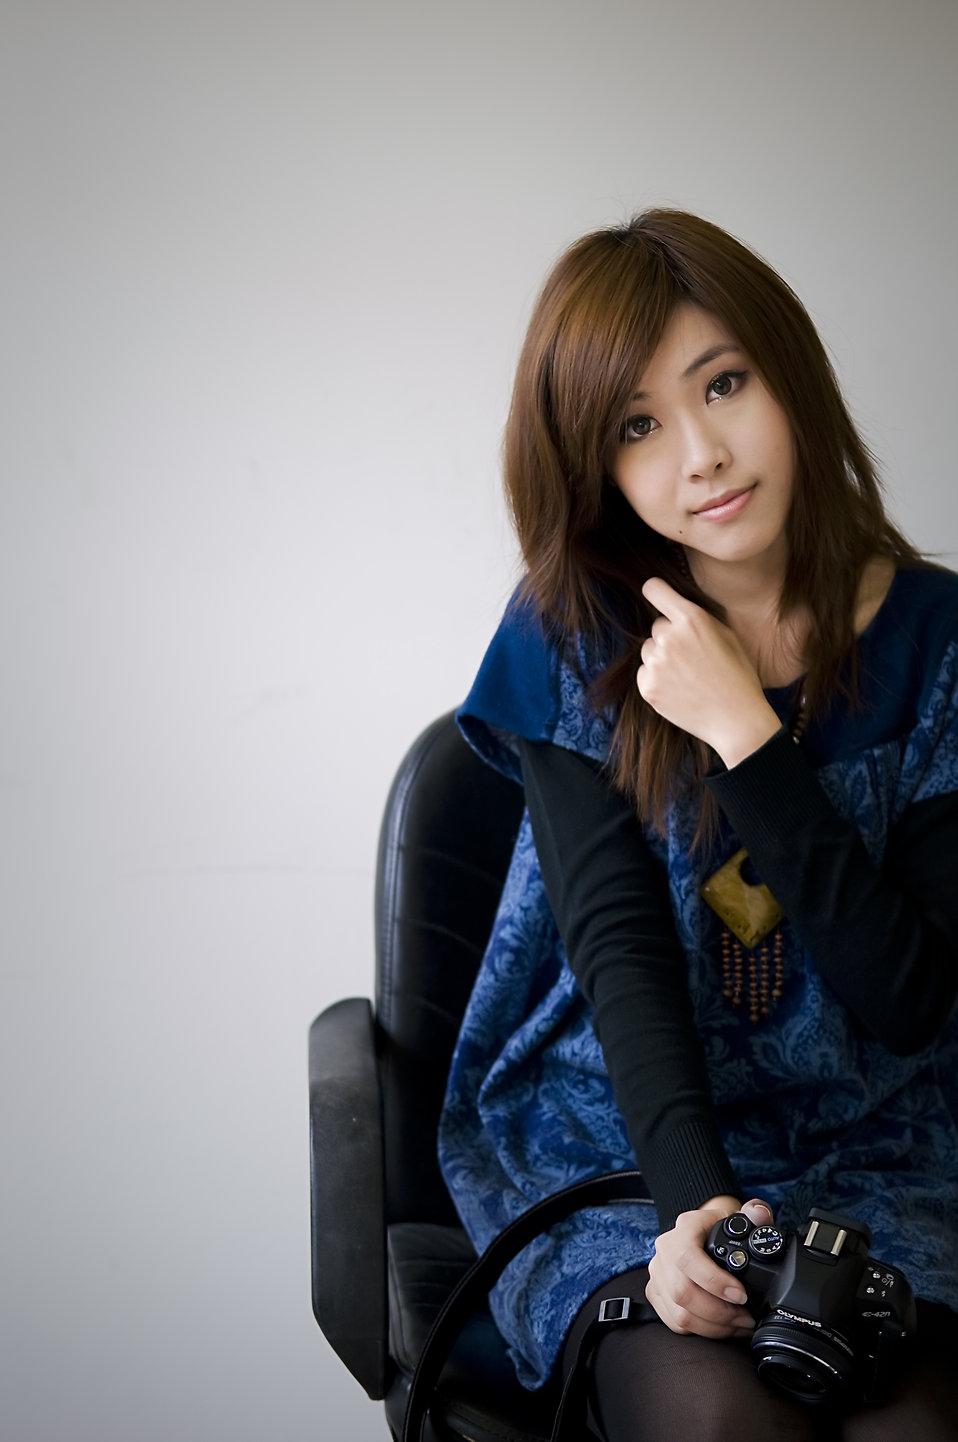 photography camera girl. A beautiful Chinese girl